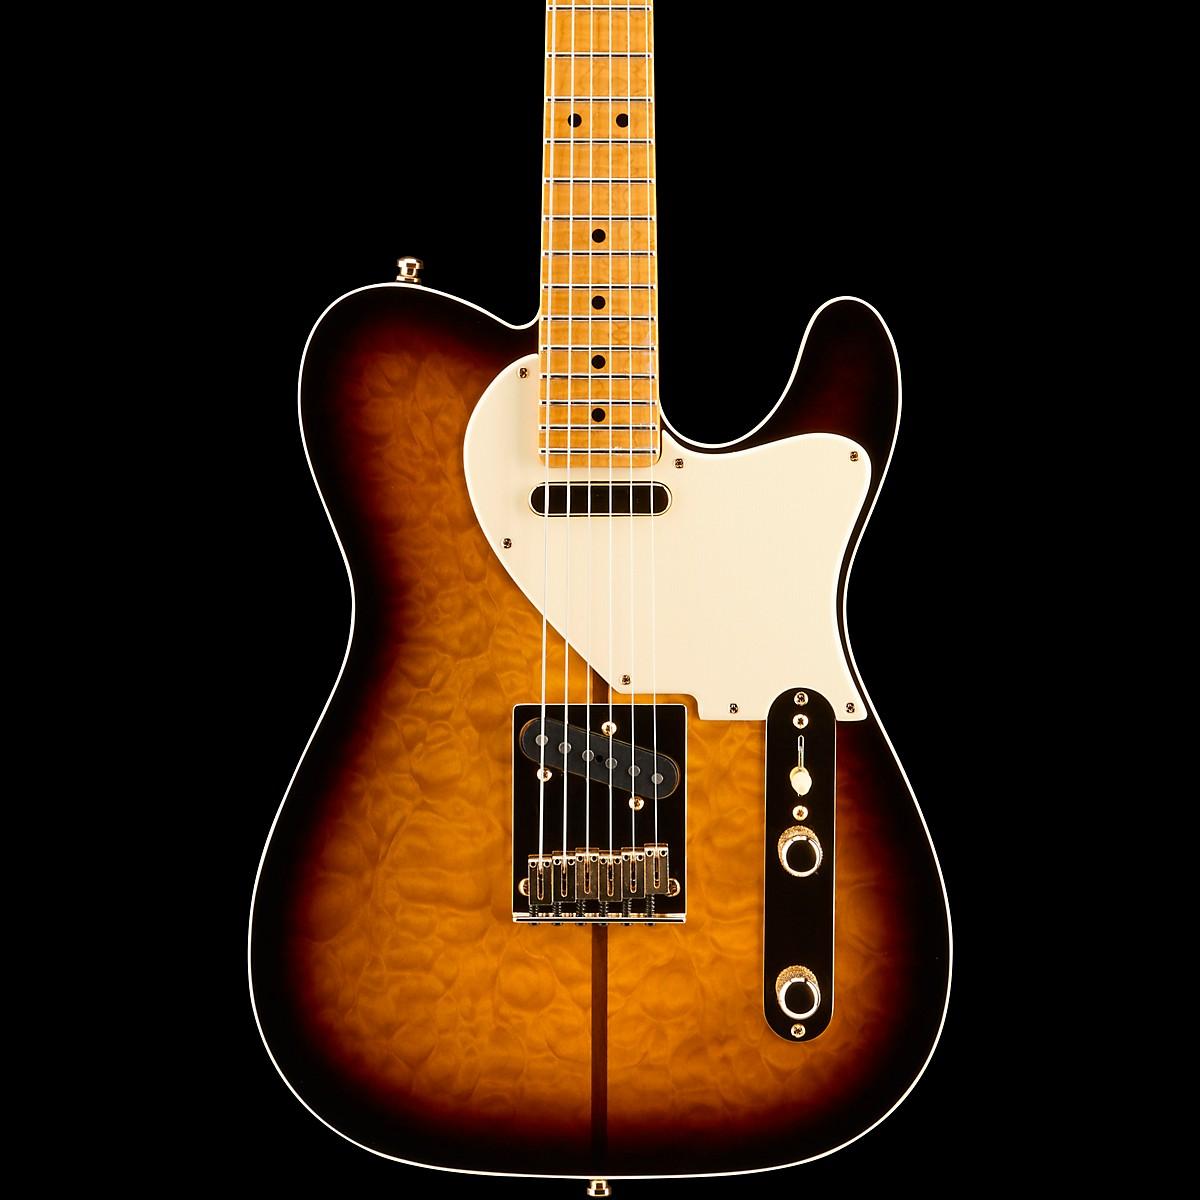 Fender Custom Shop Artist Series Merle Haggard Signature Telecaster Electric Guitar